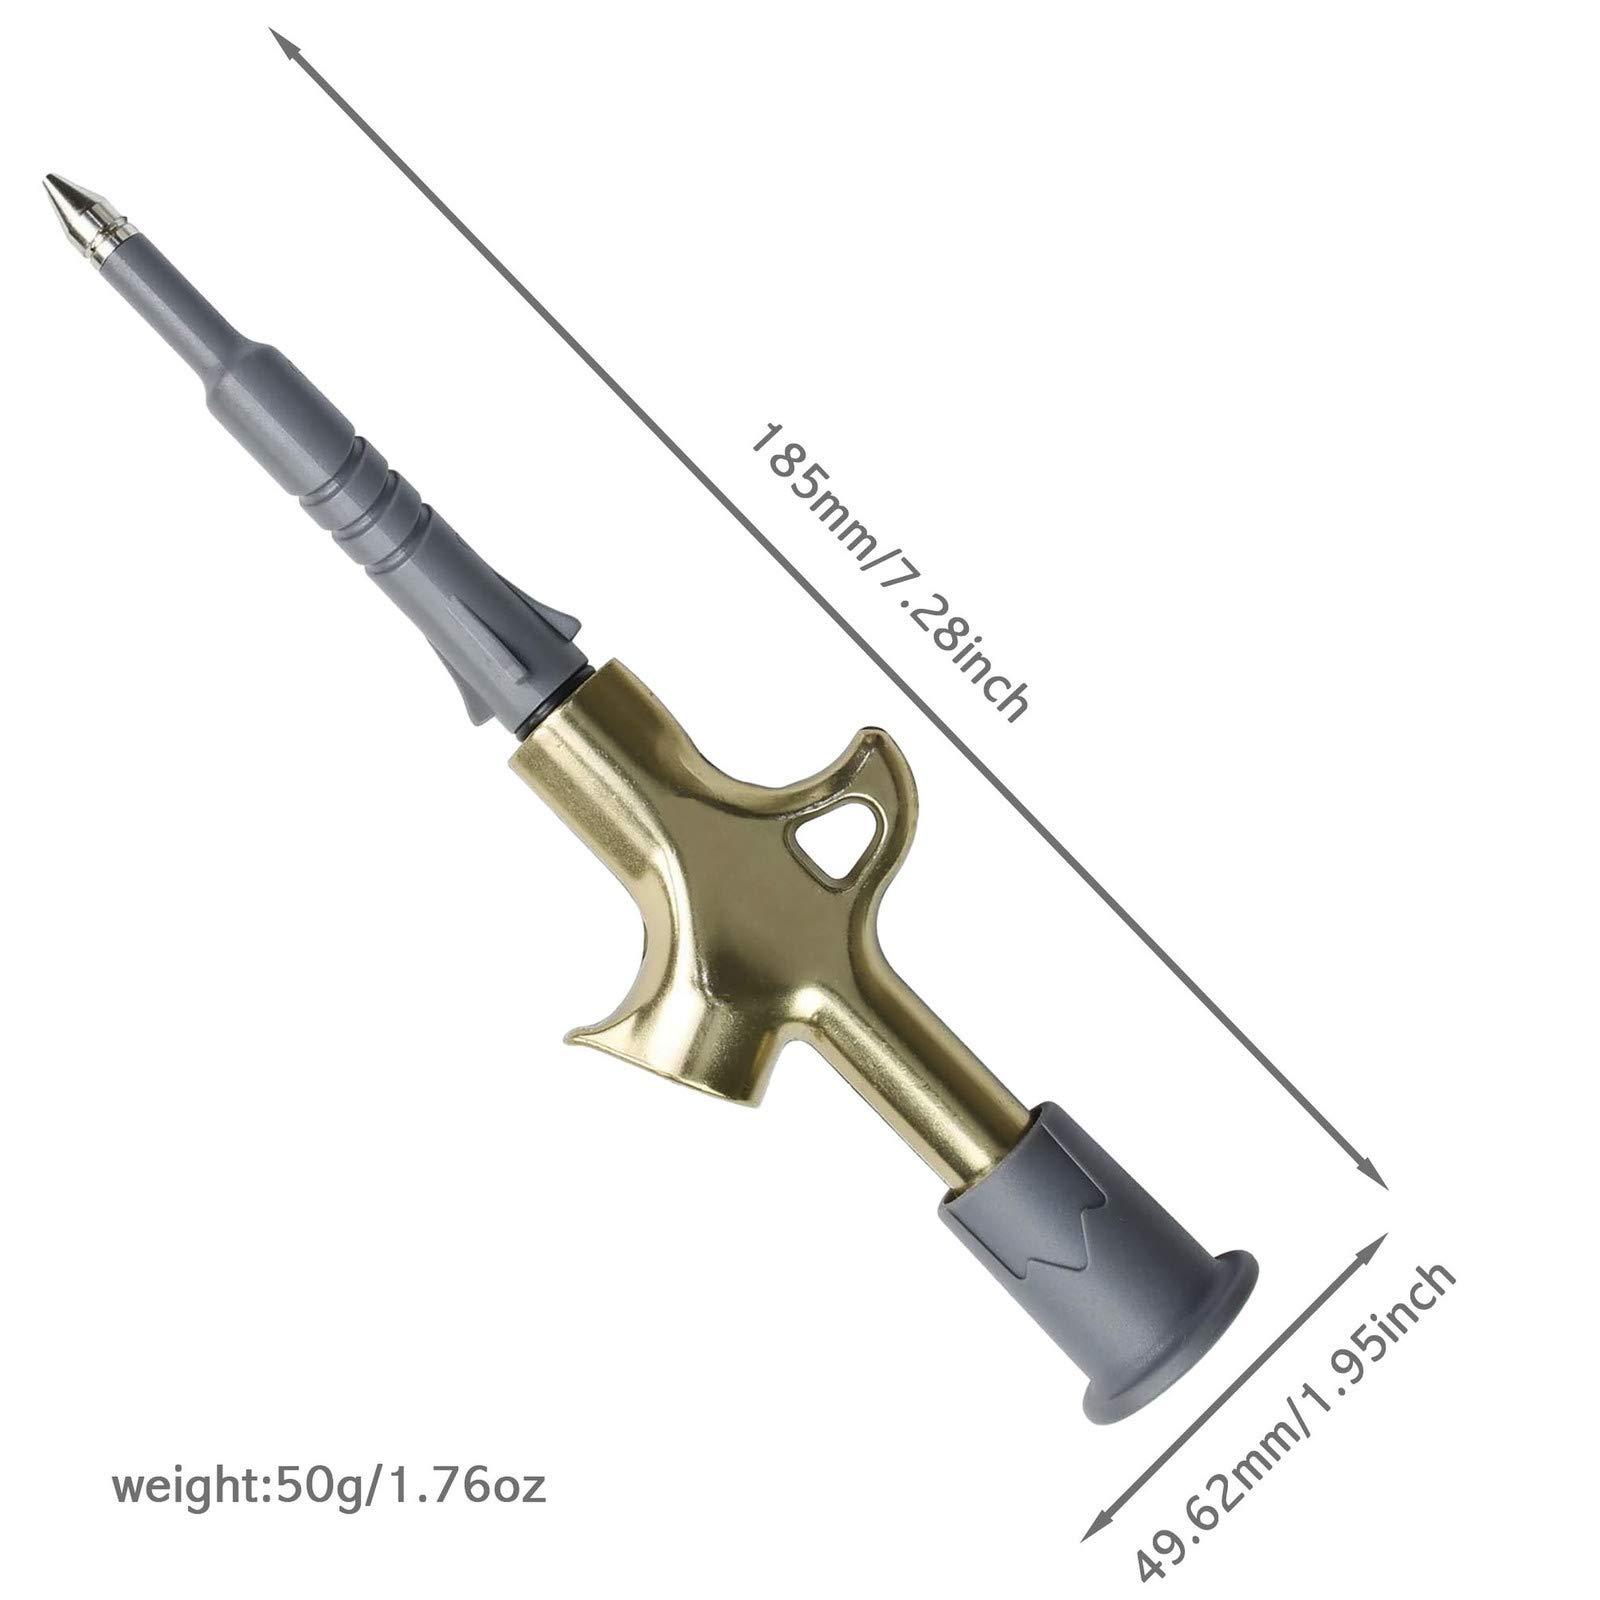 Mini Tool for Greasing CyclingDeal Bike Bicycle Grease Injector Gun